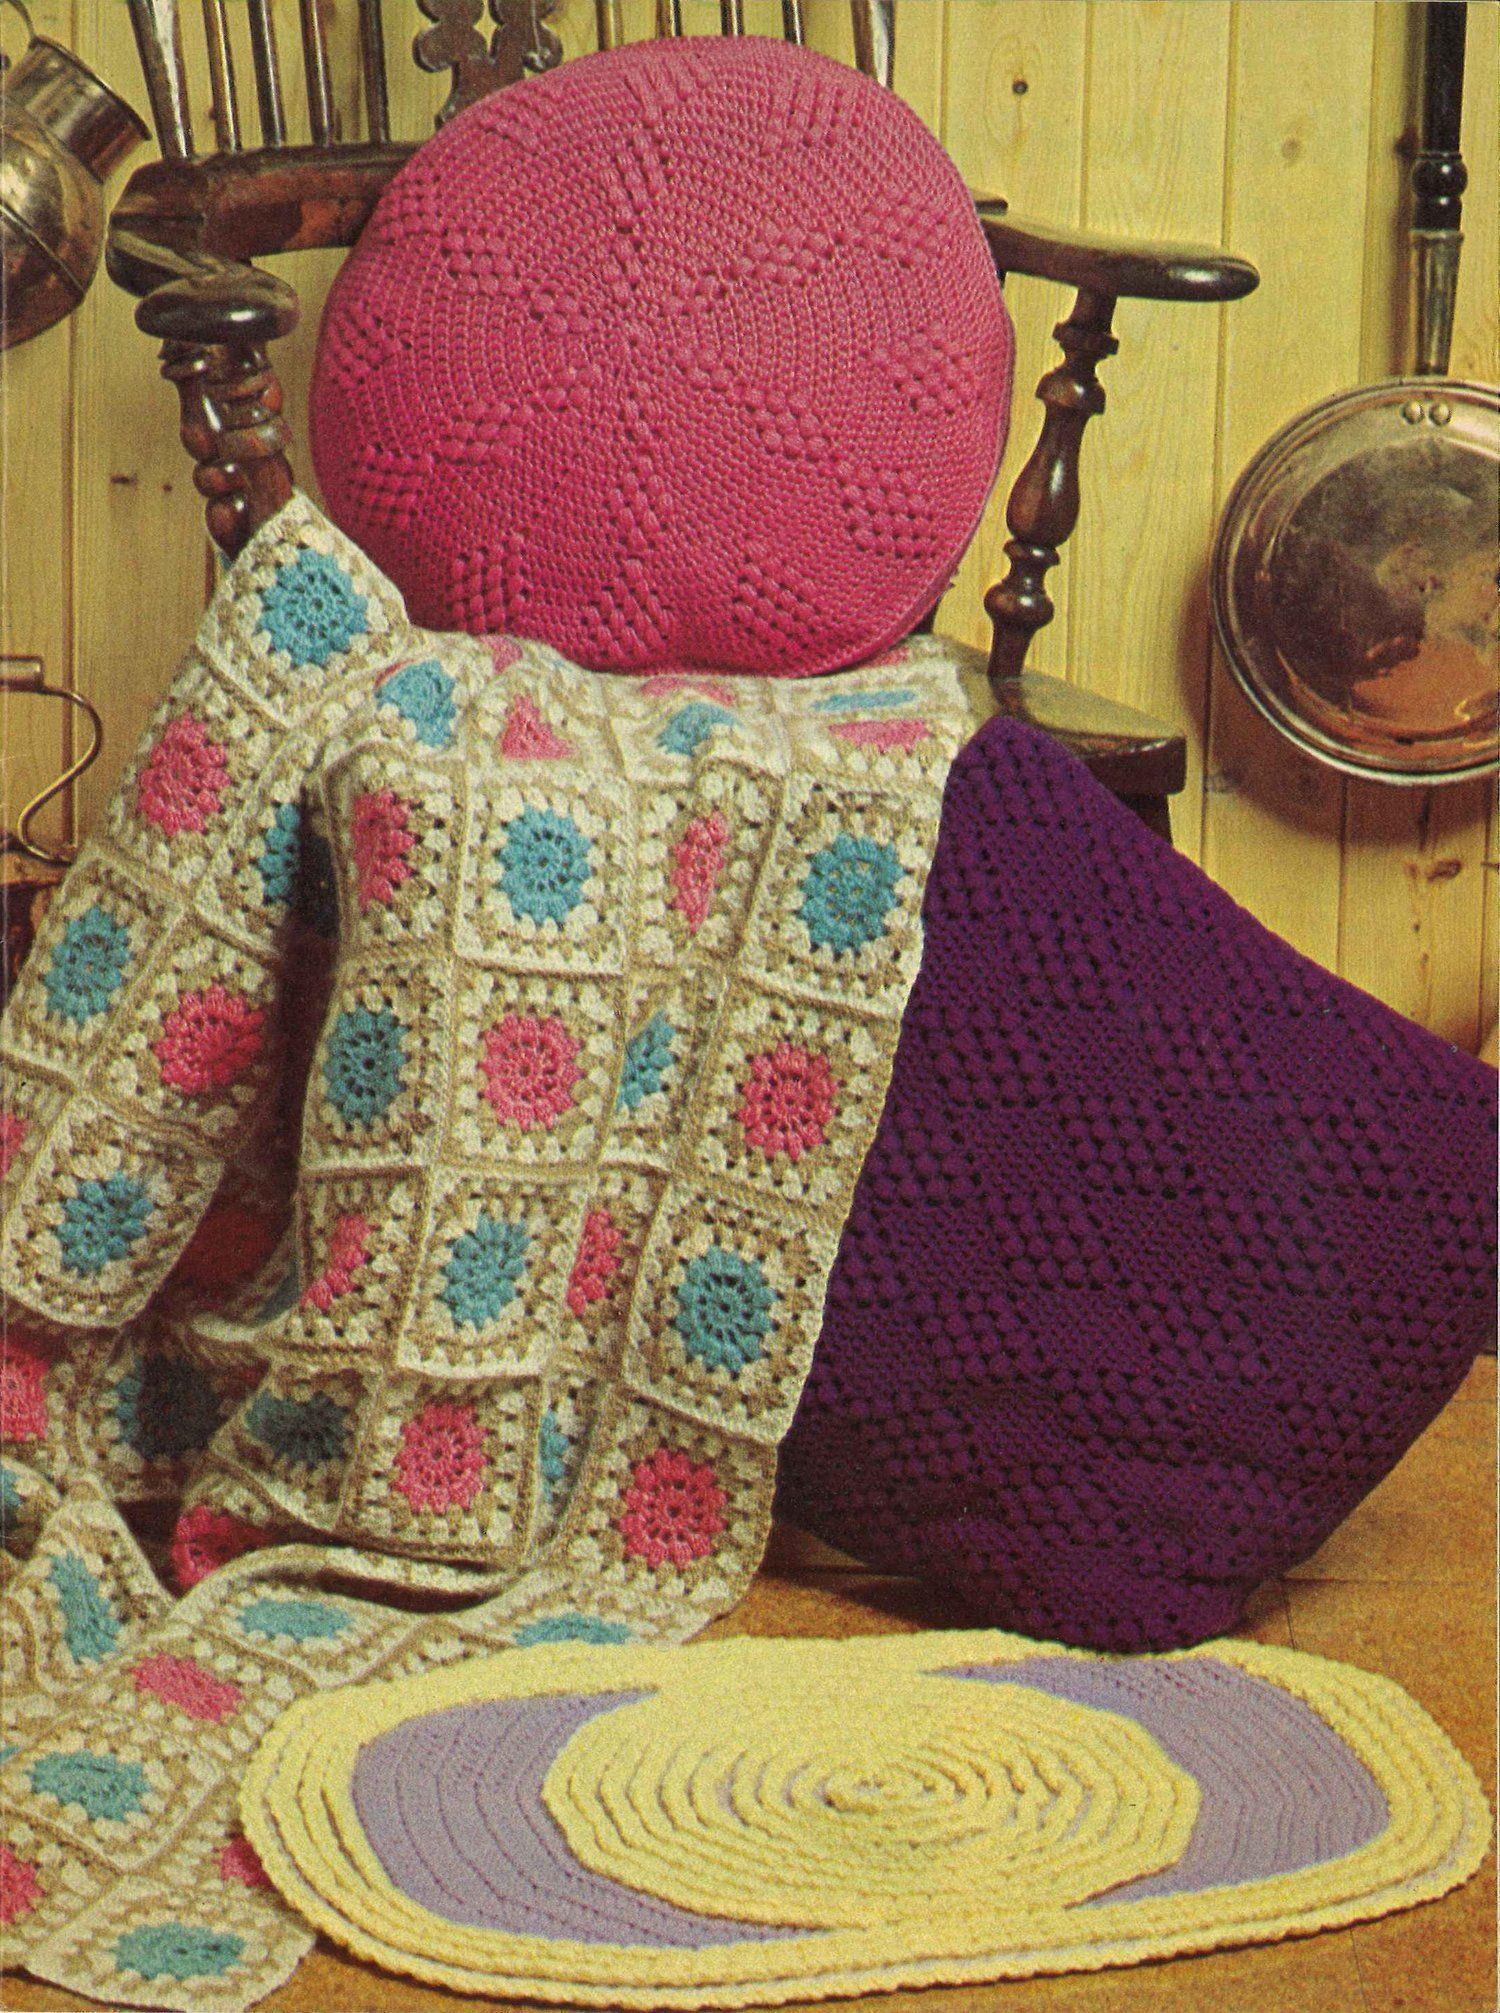 Home Hugs • 1970s Crochet Pillow Blanket Afghan Bathmat Pattern — Starshop Vintage